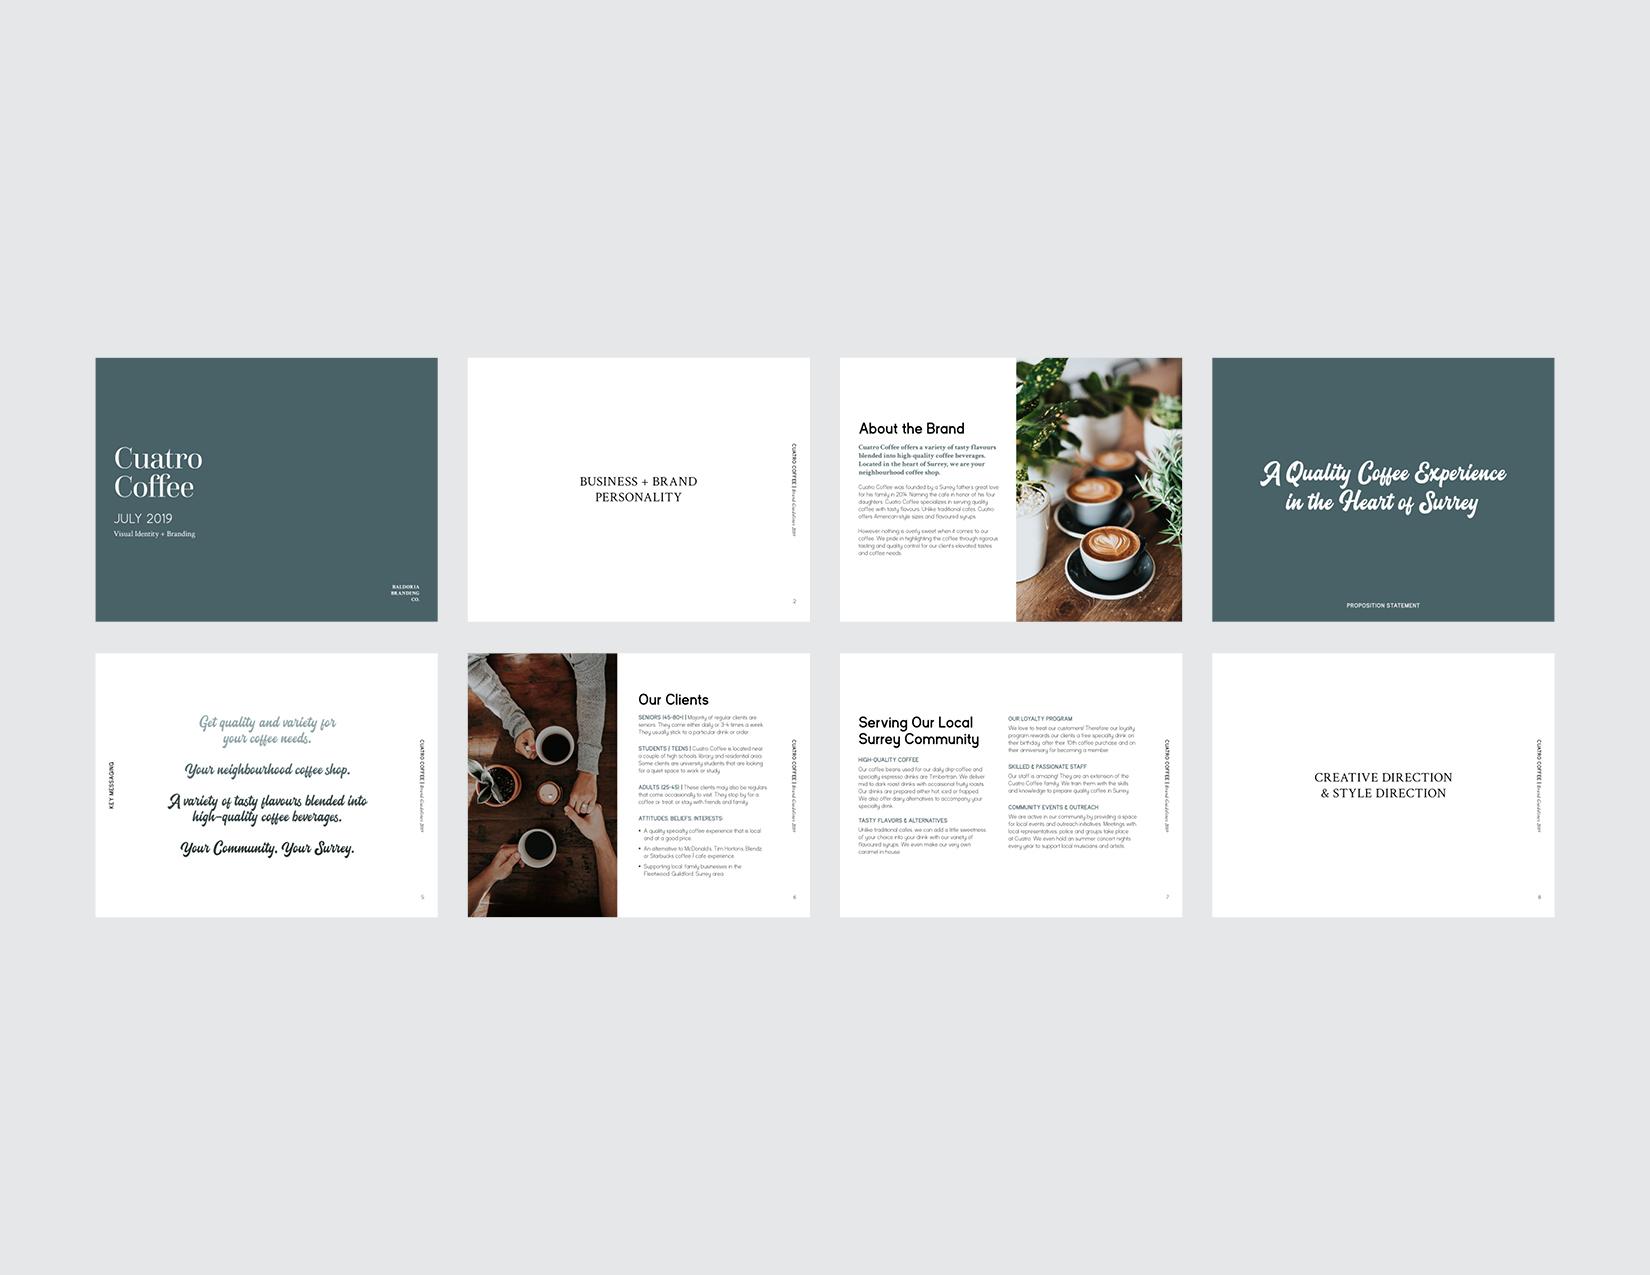 CC-branding_guidelines-overview.jpg